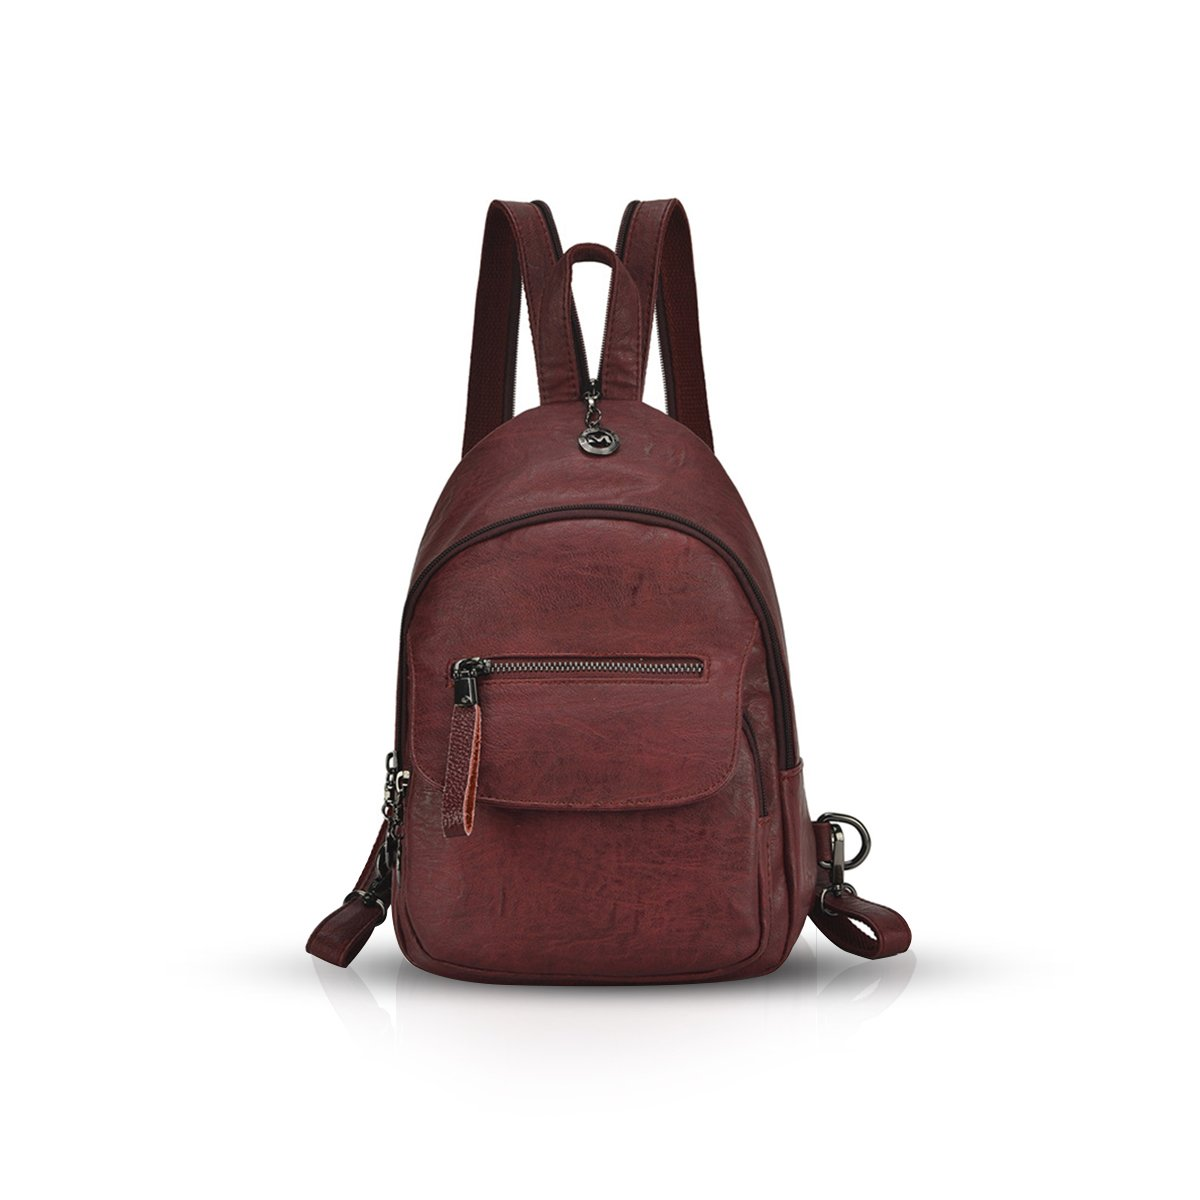 NICOLE& DORIS Women Backpack Convertible Ladies Rucksack Crossbody Shoulder Bag PU Leather ND-ZE001